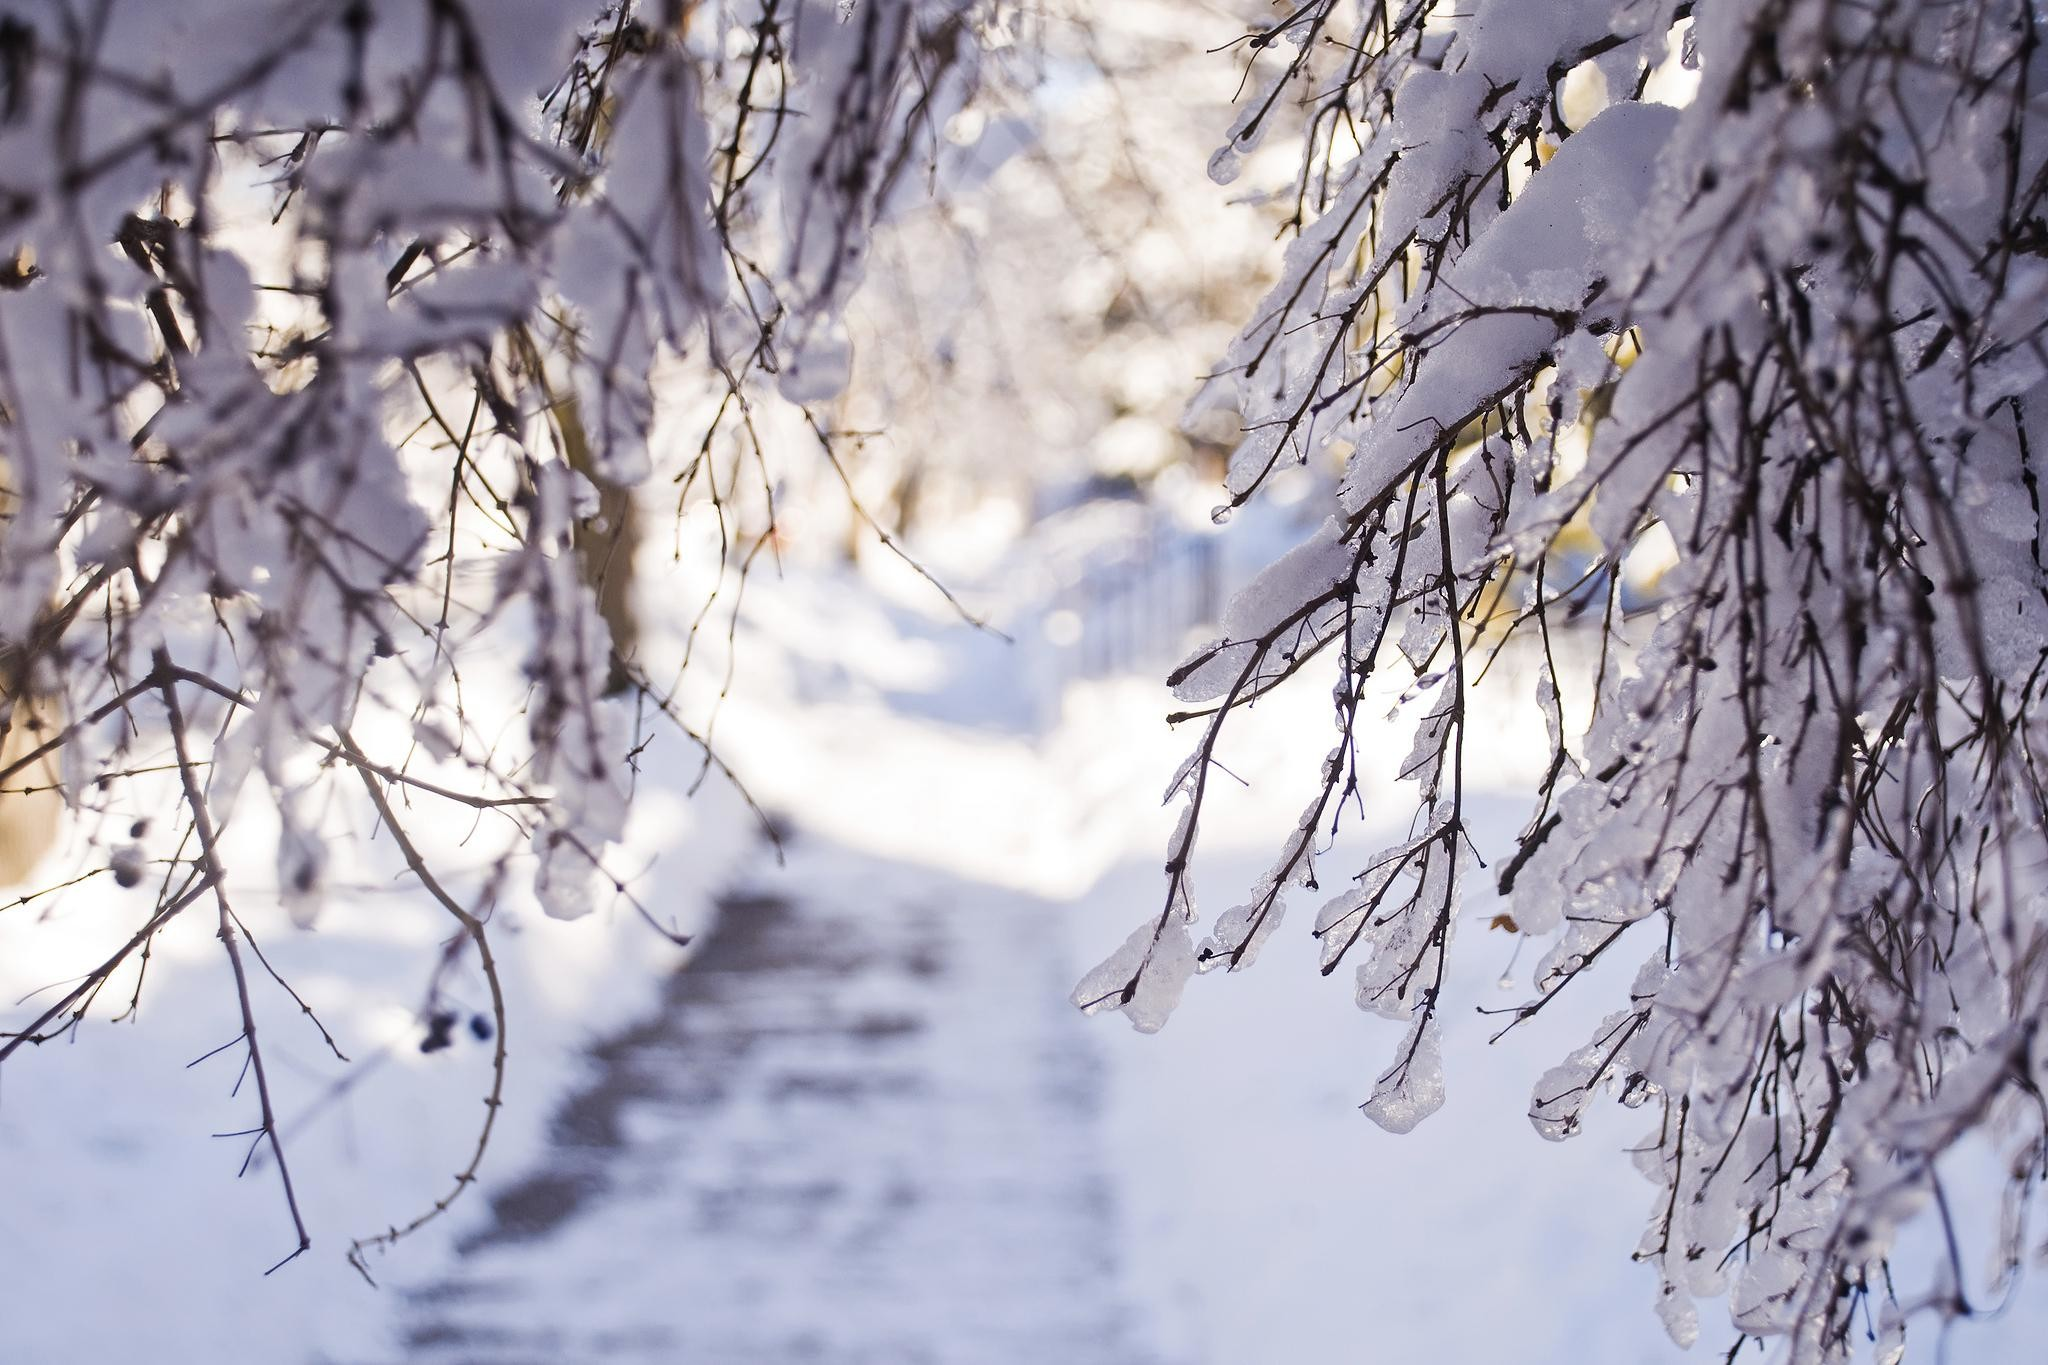 Winter Snow Branches Light Desktop Background Images